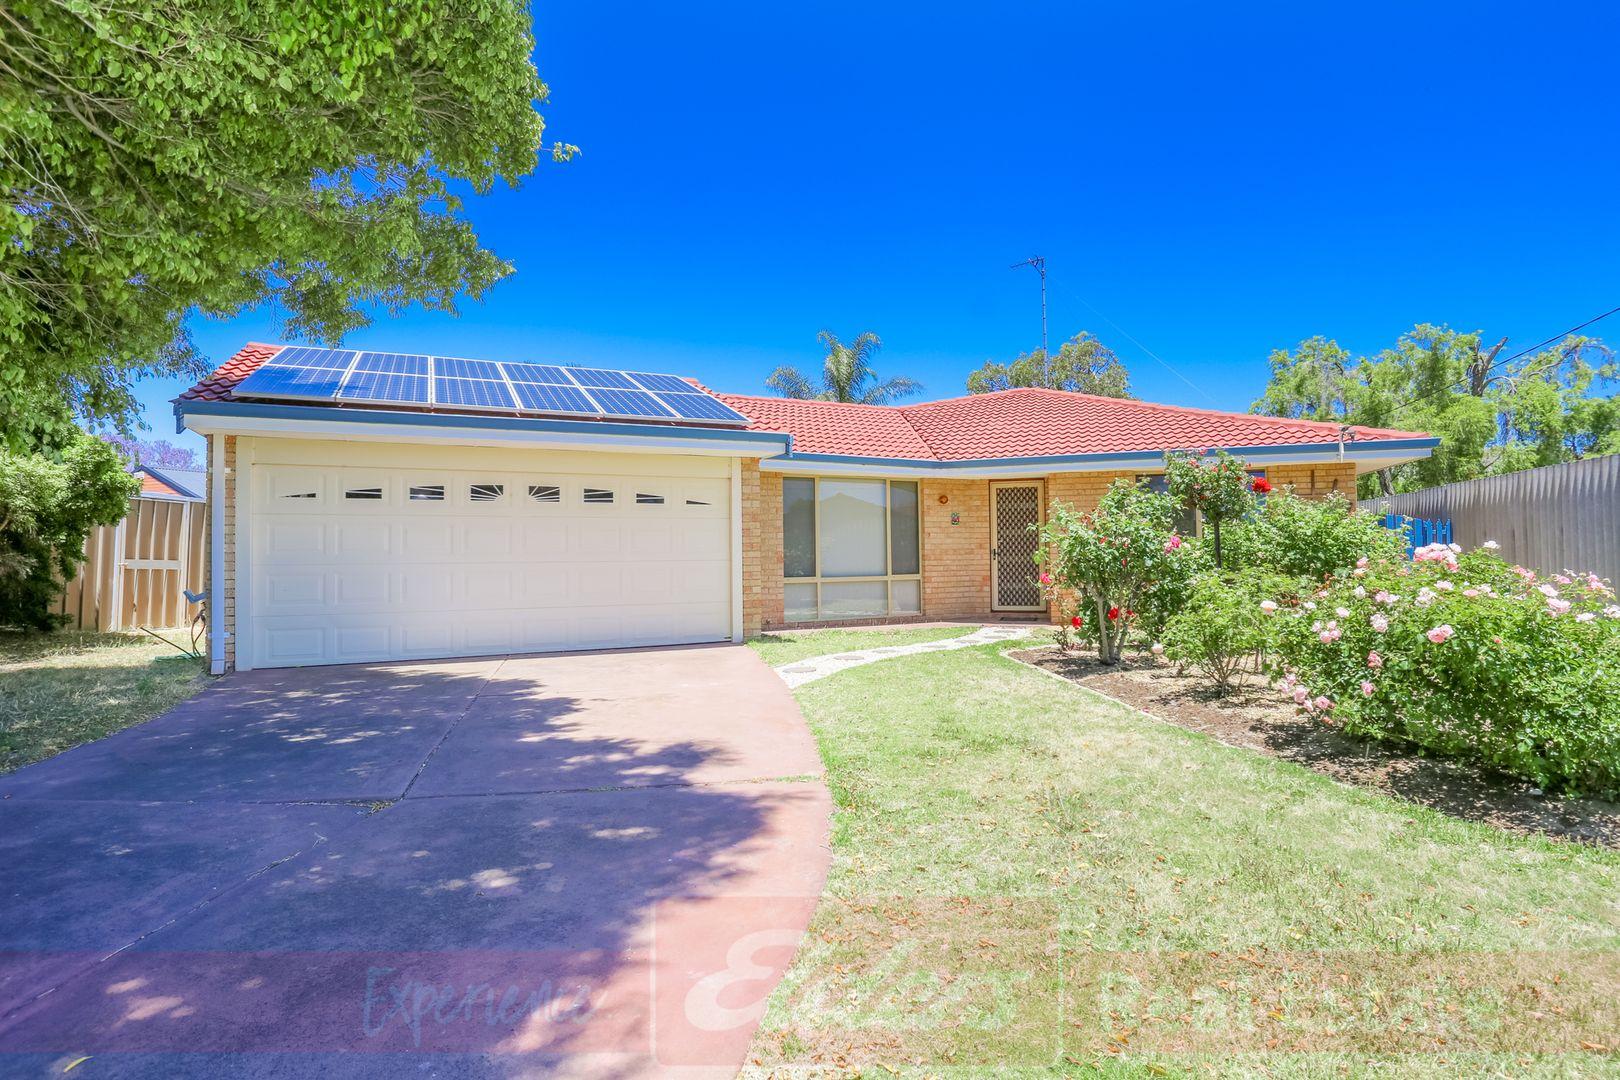 169 Lucy Victoria Avenue, Australind WA 6233, Image 0